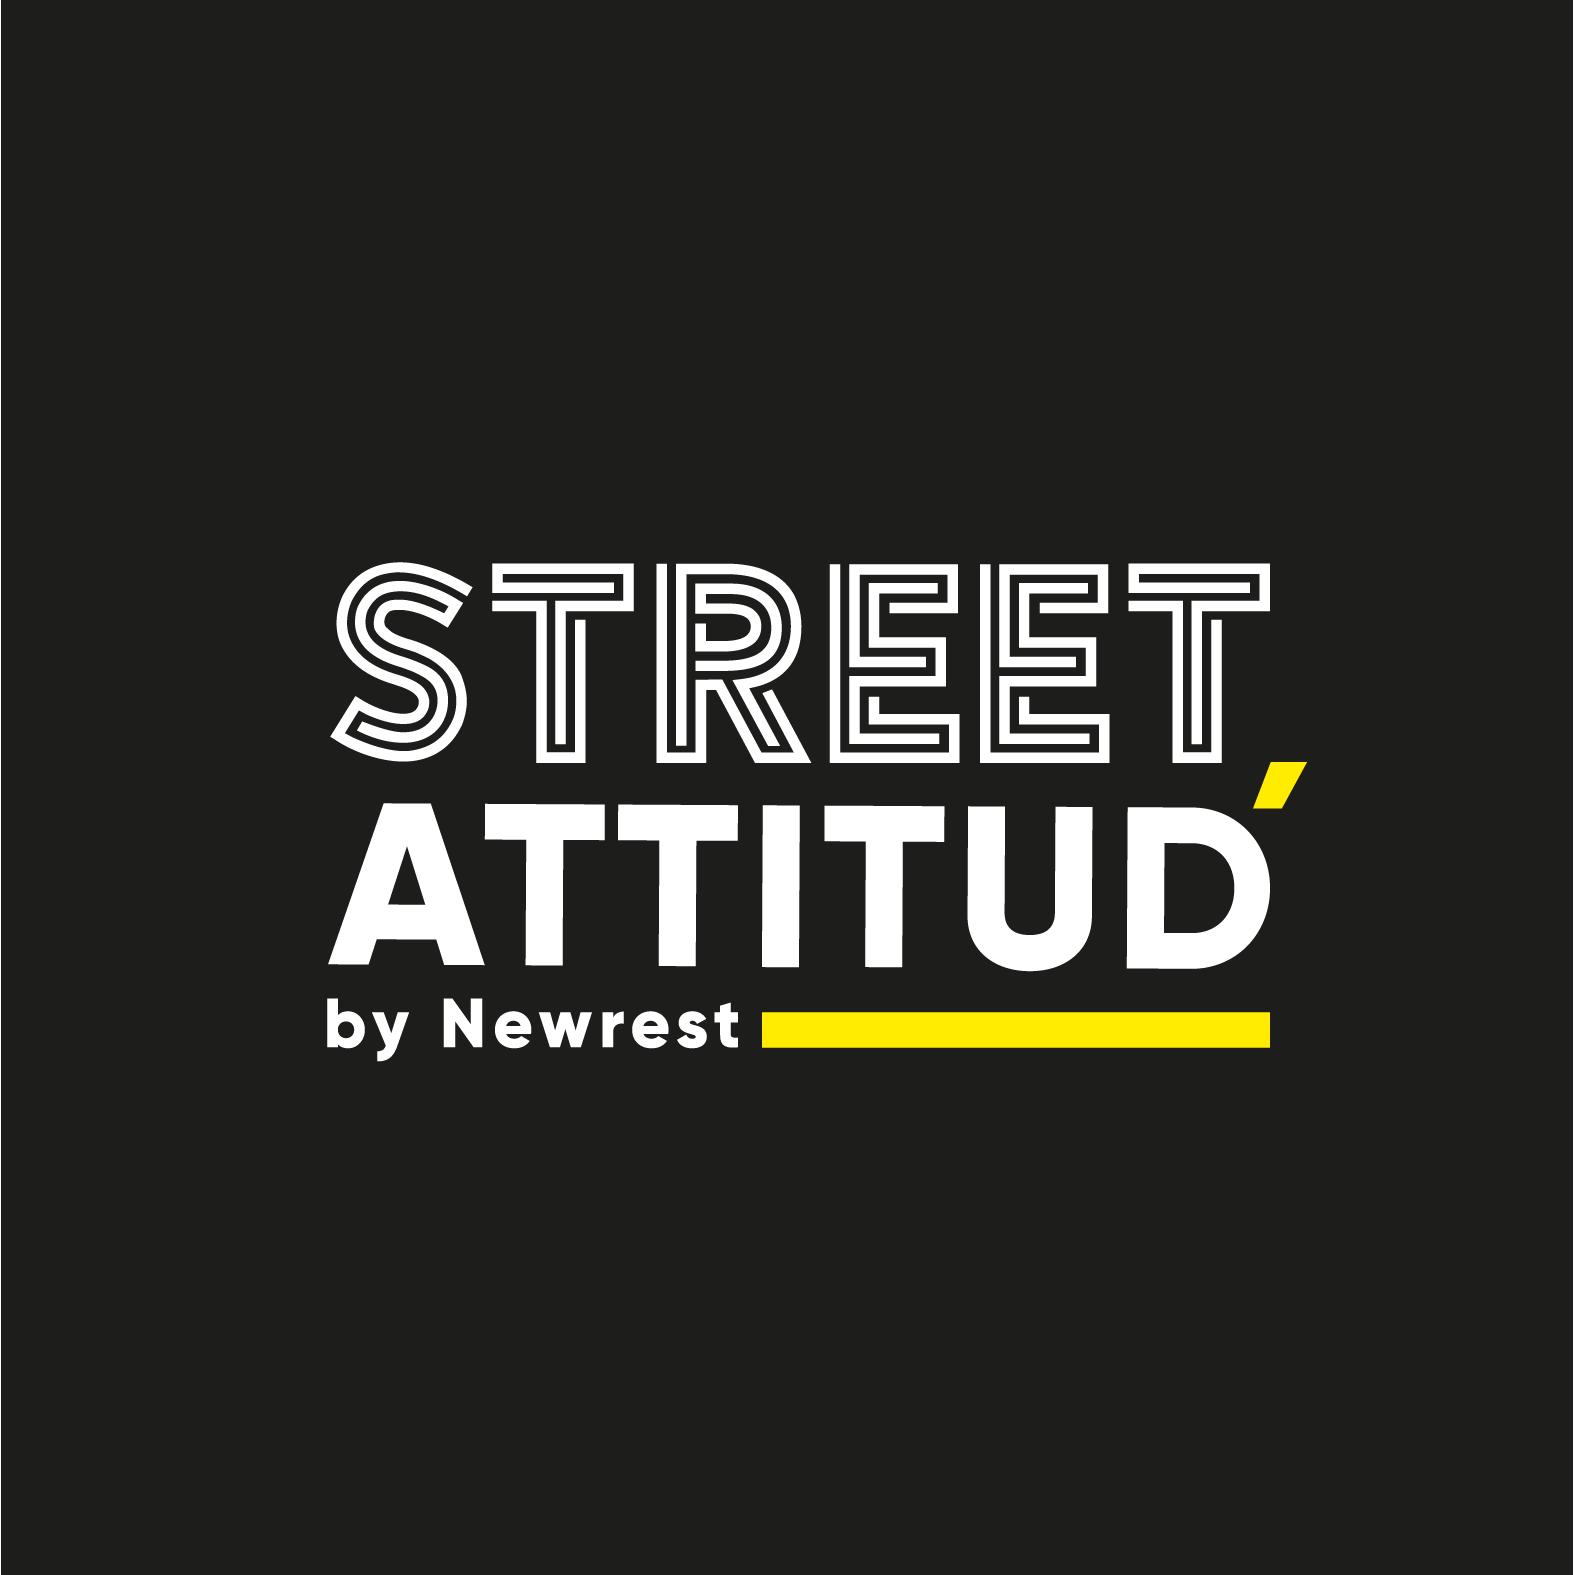 Carte Street Attitude Semaine